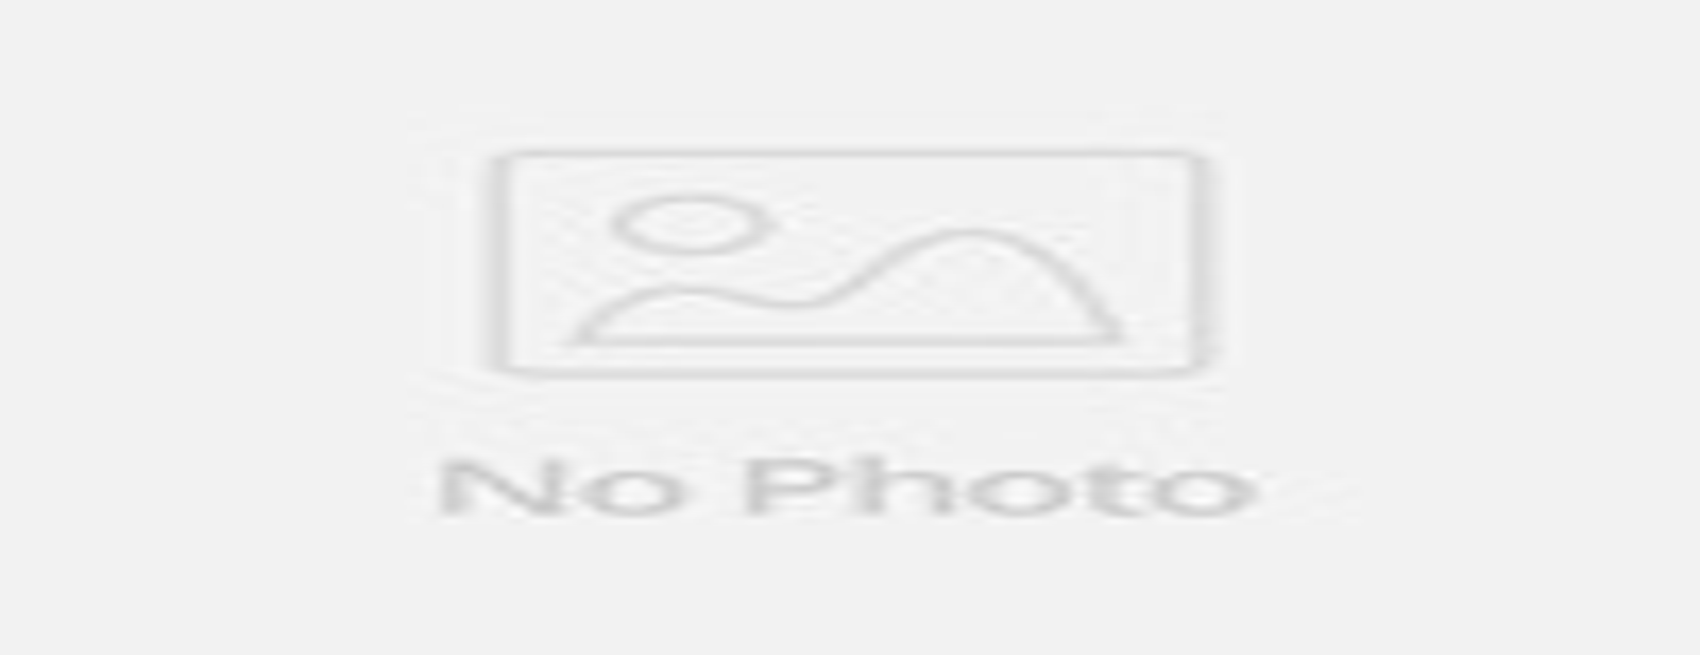 Kitchen Cabinet Skins Uv006 - Buy Kitchen Cabinet Skins,Kitchen ...